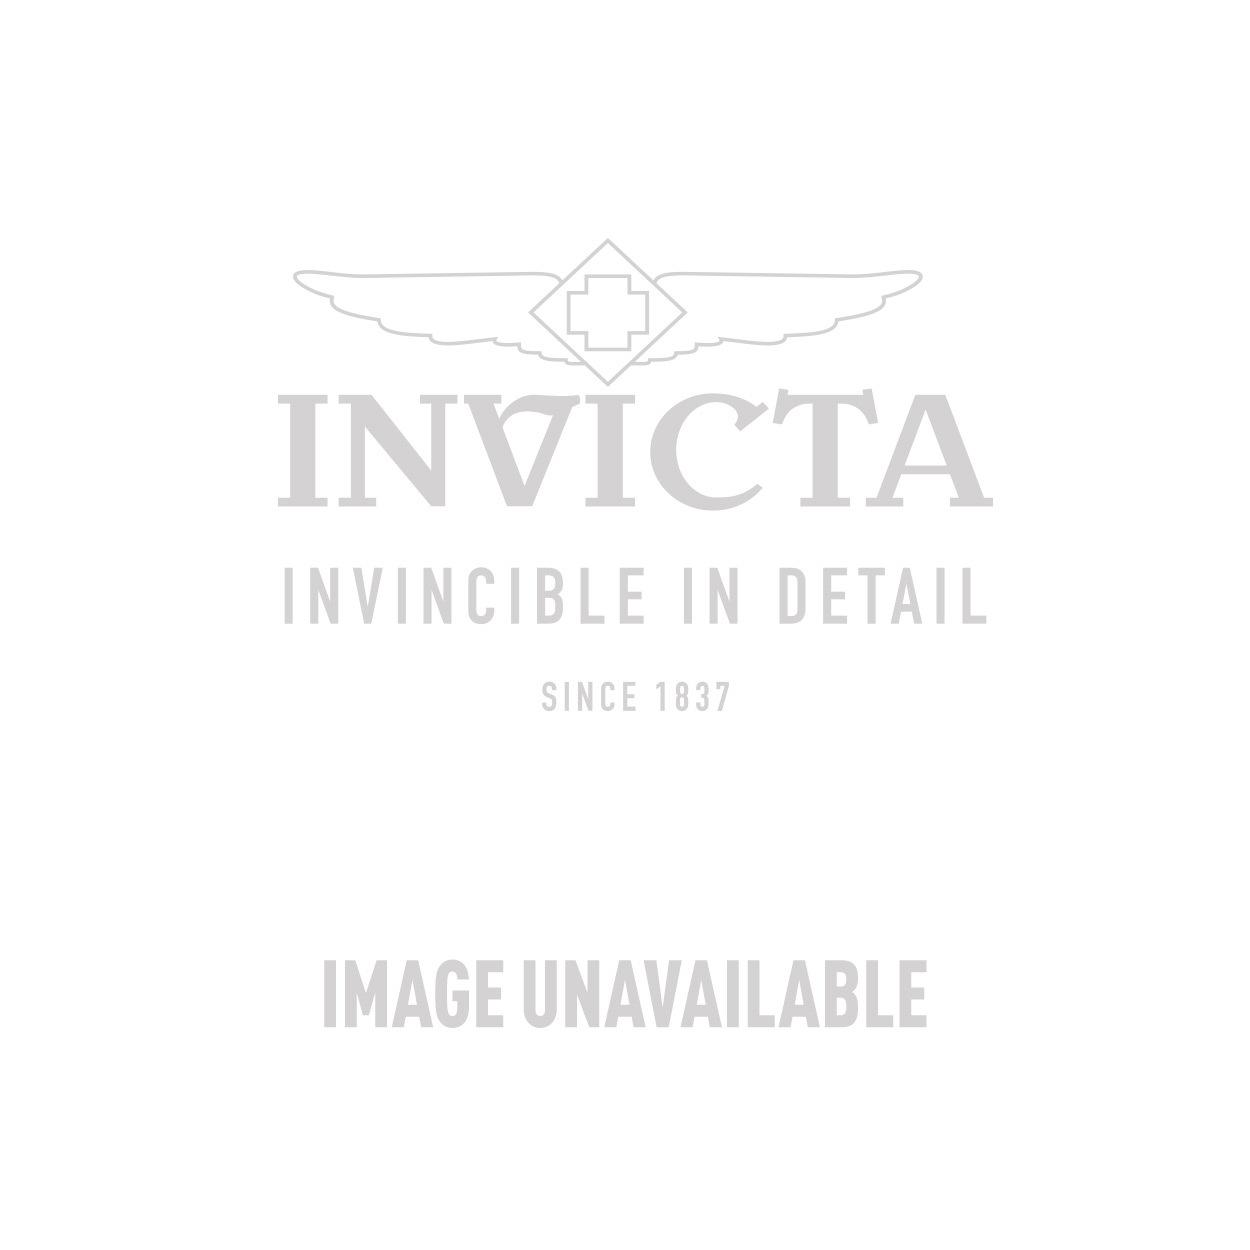 Invicta Vintage Mens Quartz 43mm Gunmetal Case Silver, White Dial - Model 23131